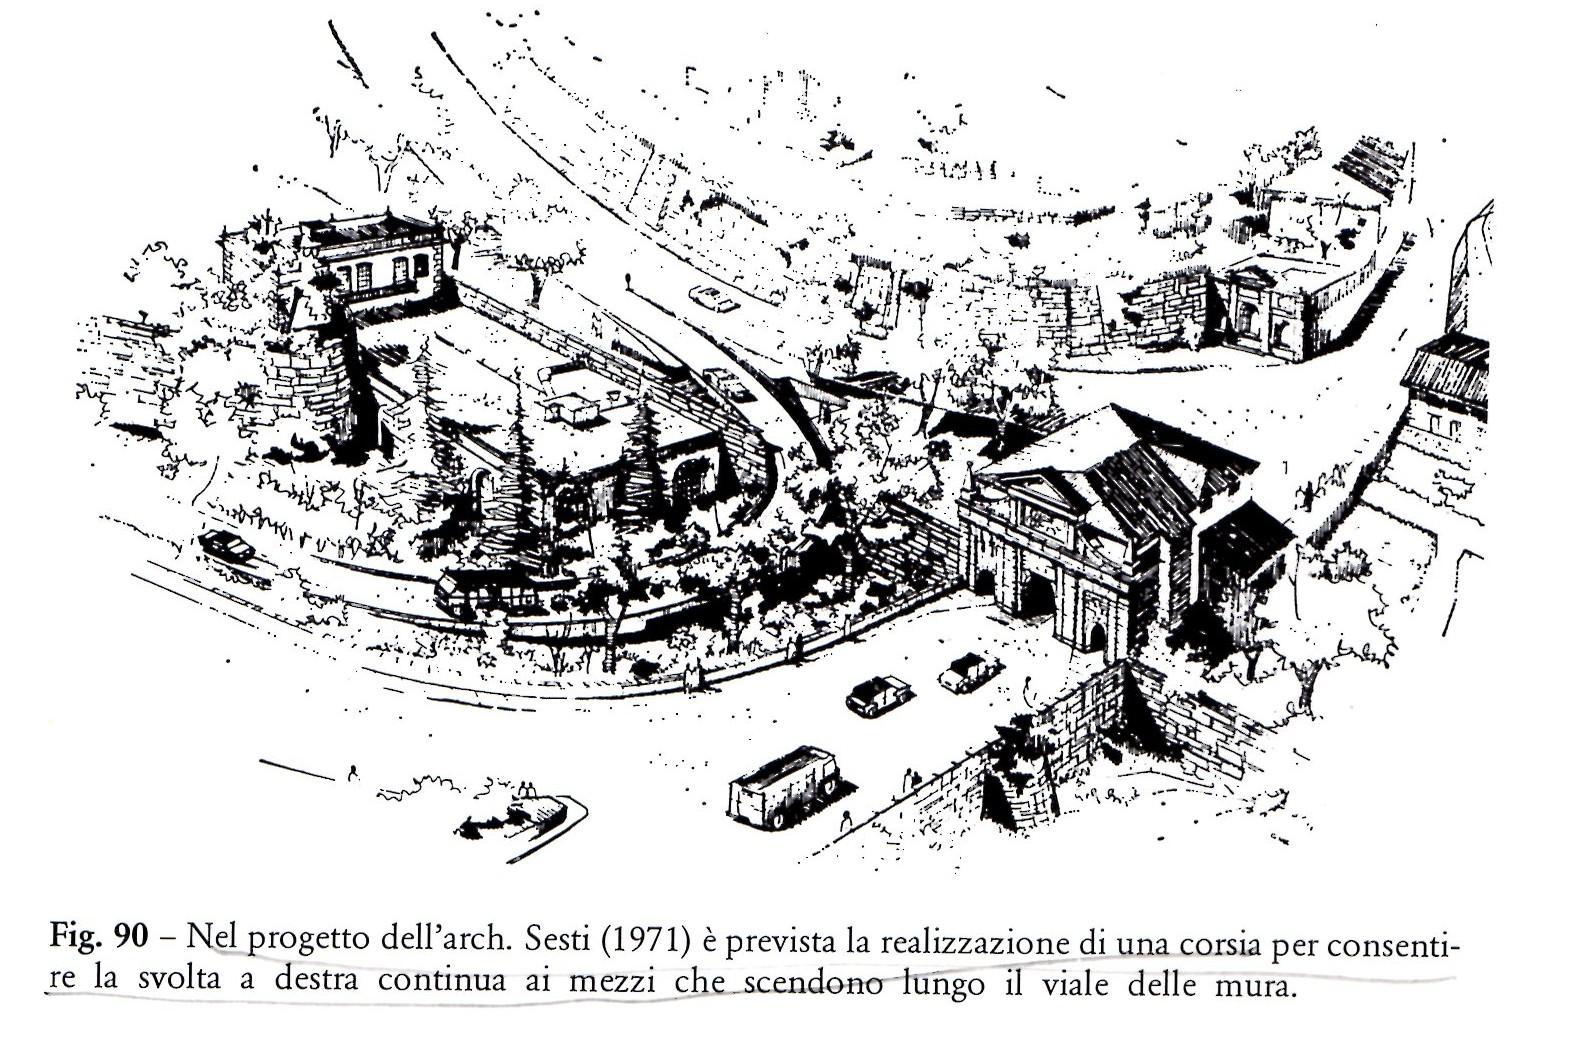 progetoo Sesti -1971